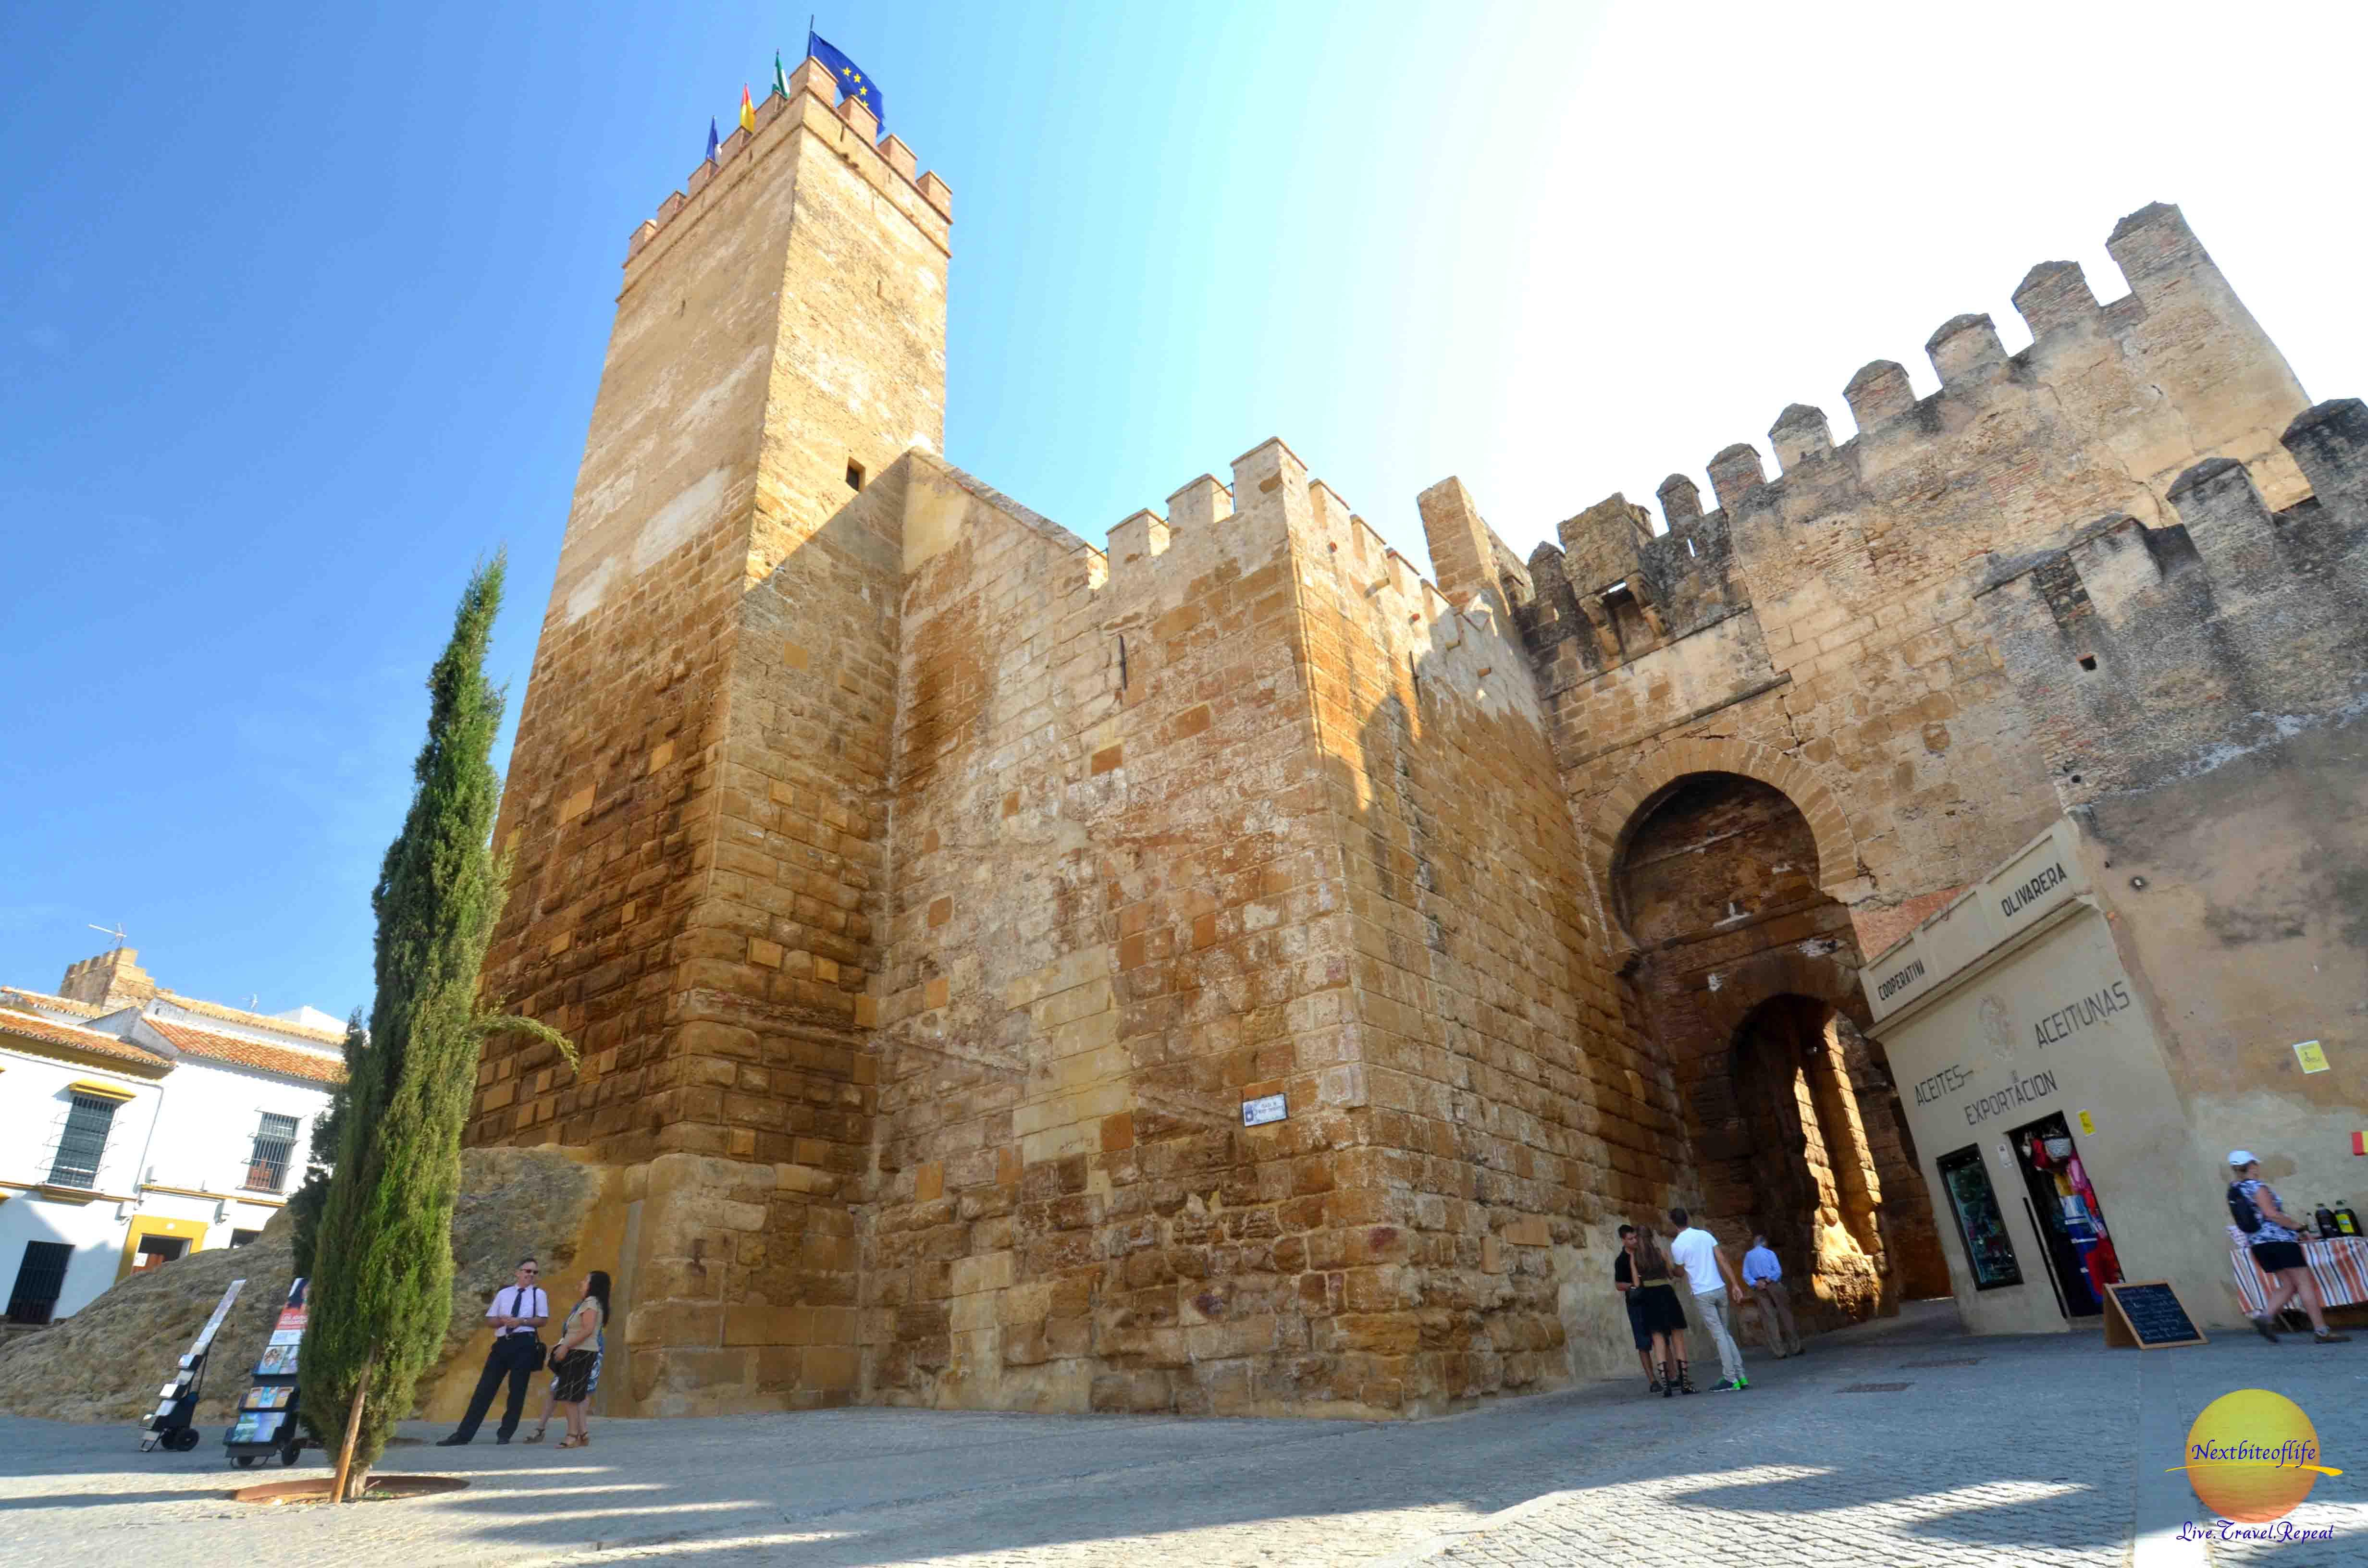 Carmona fortress of the gate of seville nextbiteoflife for Puerta de sevilla carmona